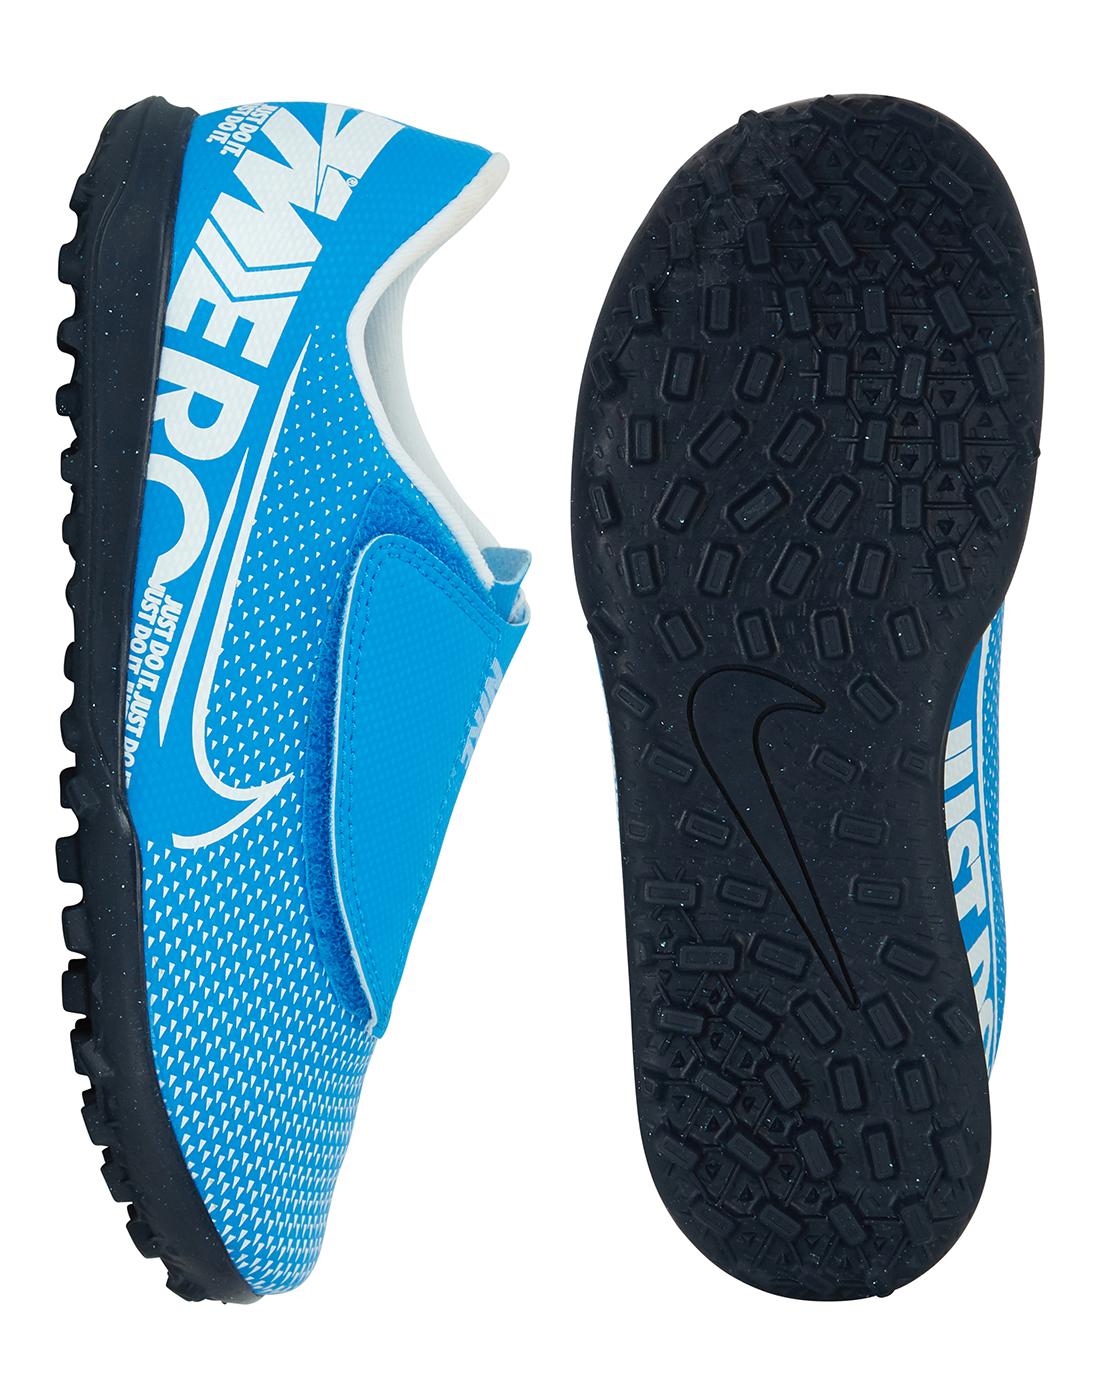 tela delicadeza Gracioso  Nike KIDS MERCURIAL VAPOR 13 CLUB TF | Life Style Sports